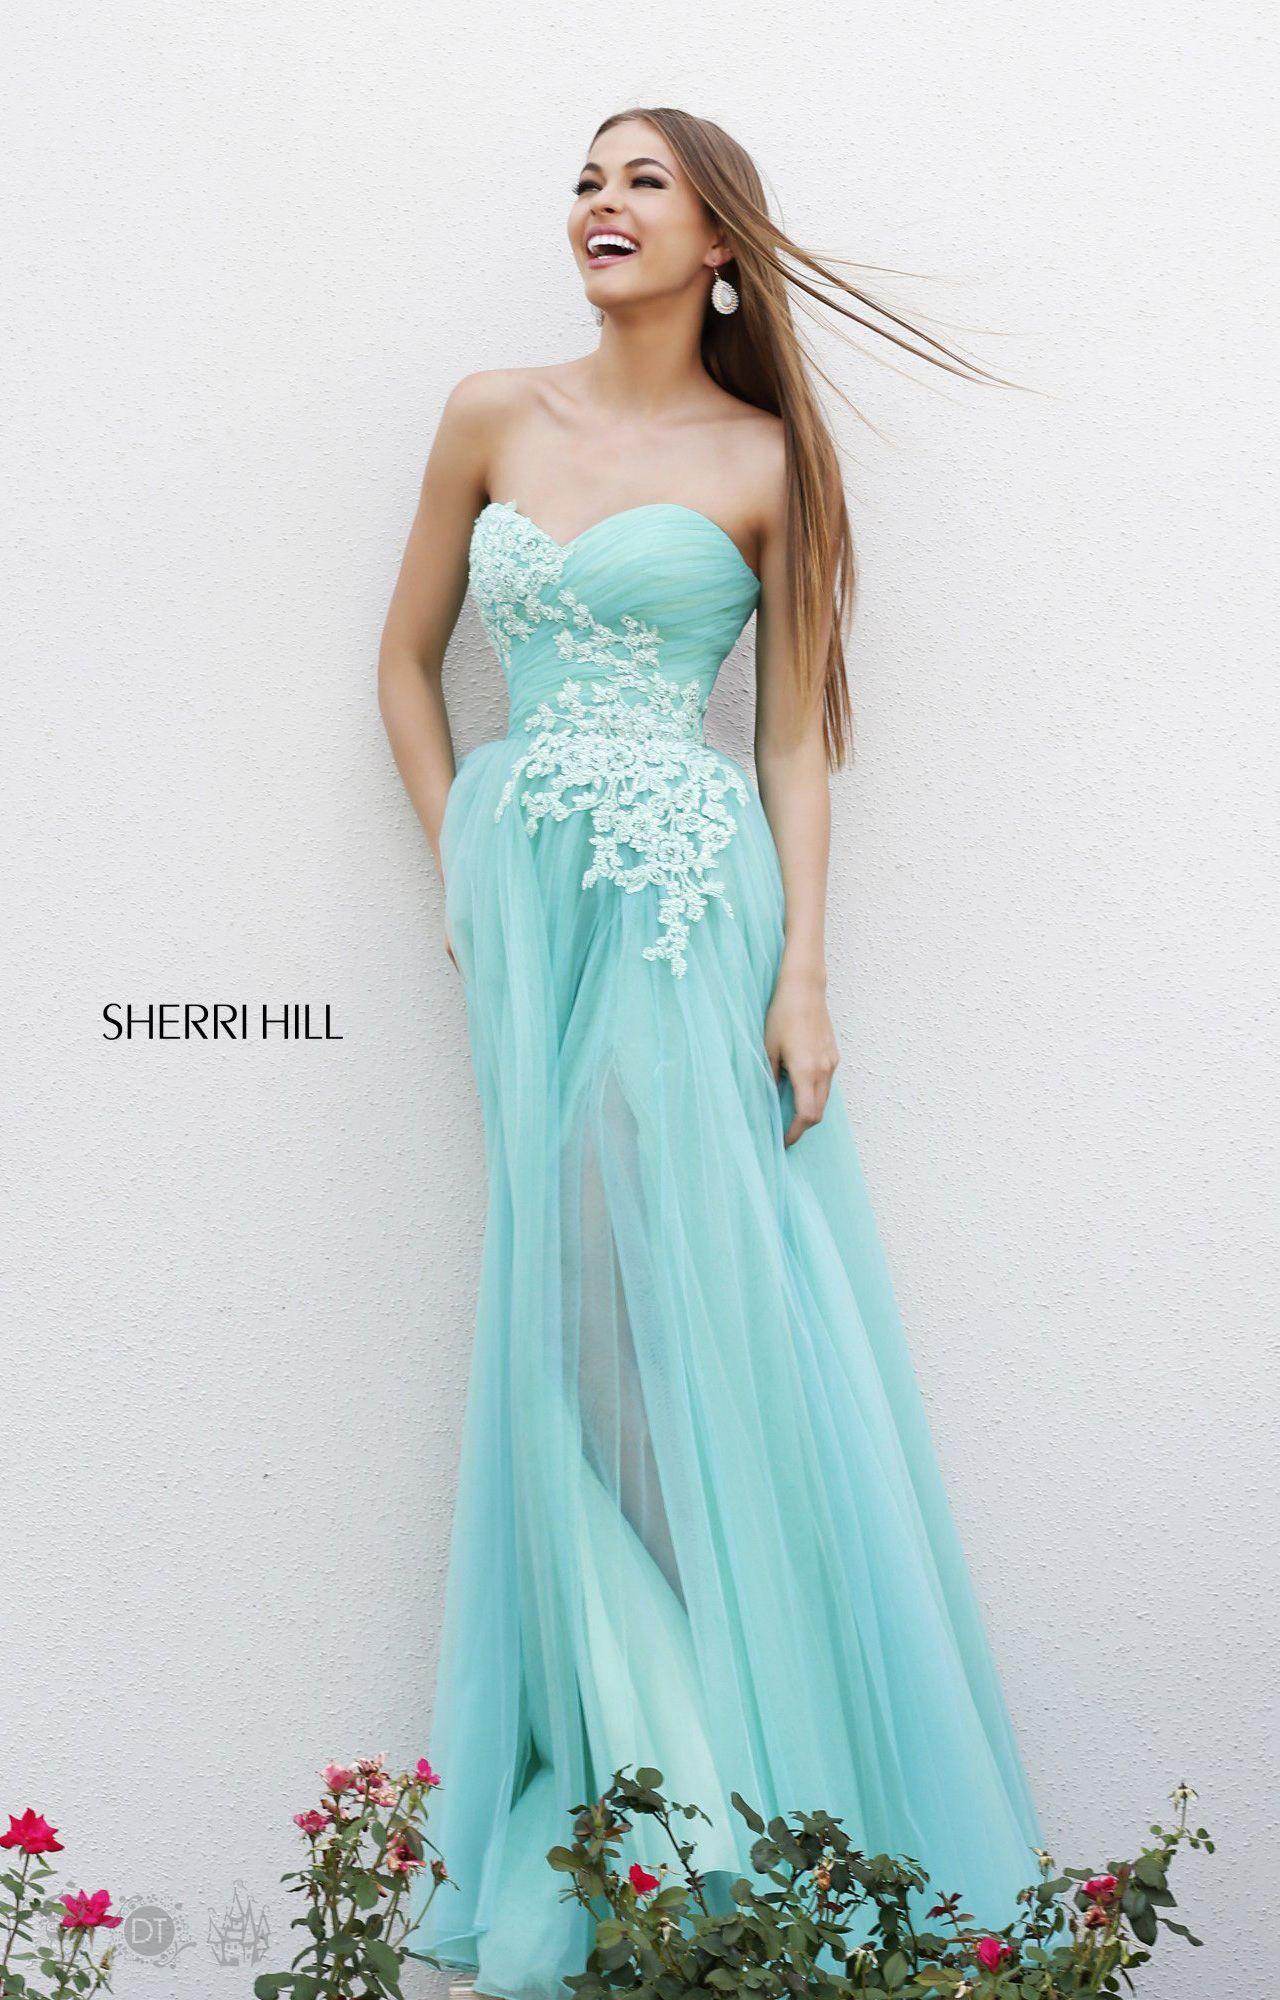 Sherri hill lace wedding dress  Sherri Hill  Sherri Hill  Pinterest  Image search Sherri hill